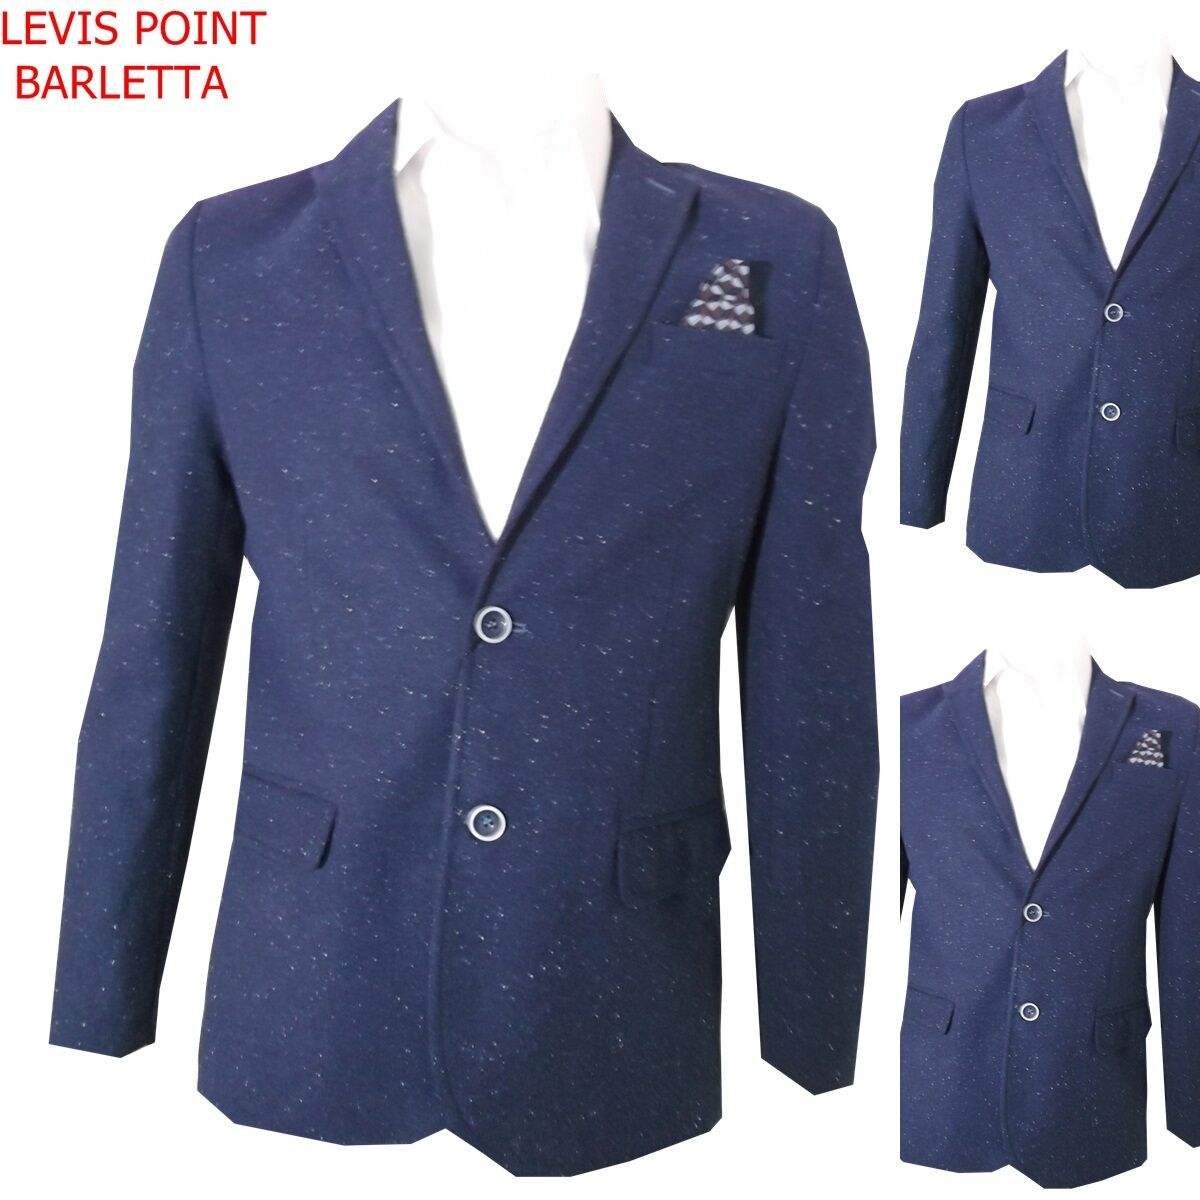 Giacca Slim men lana invernale fantasia twill blue Tagli 46 48 50 52 54 56 58